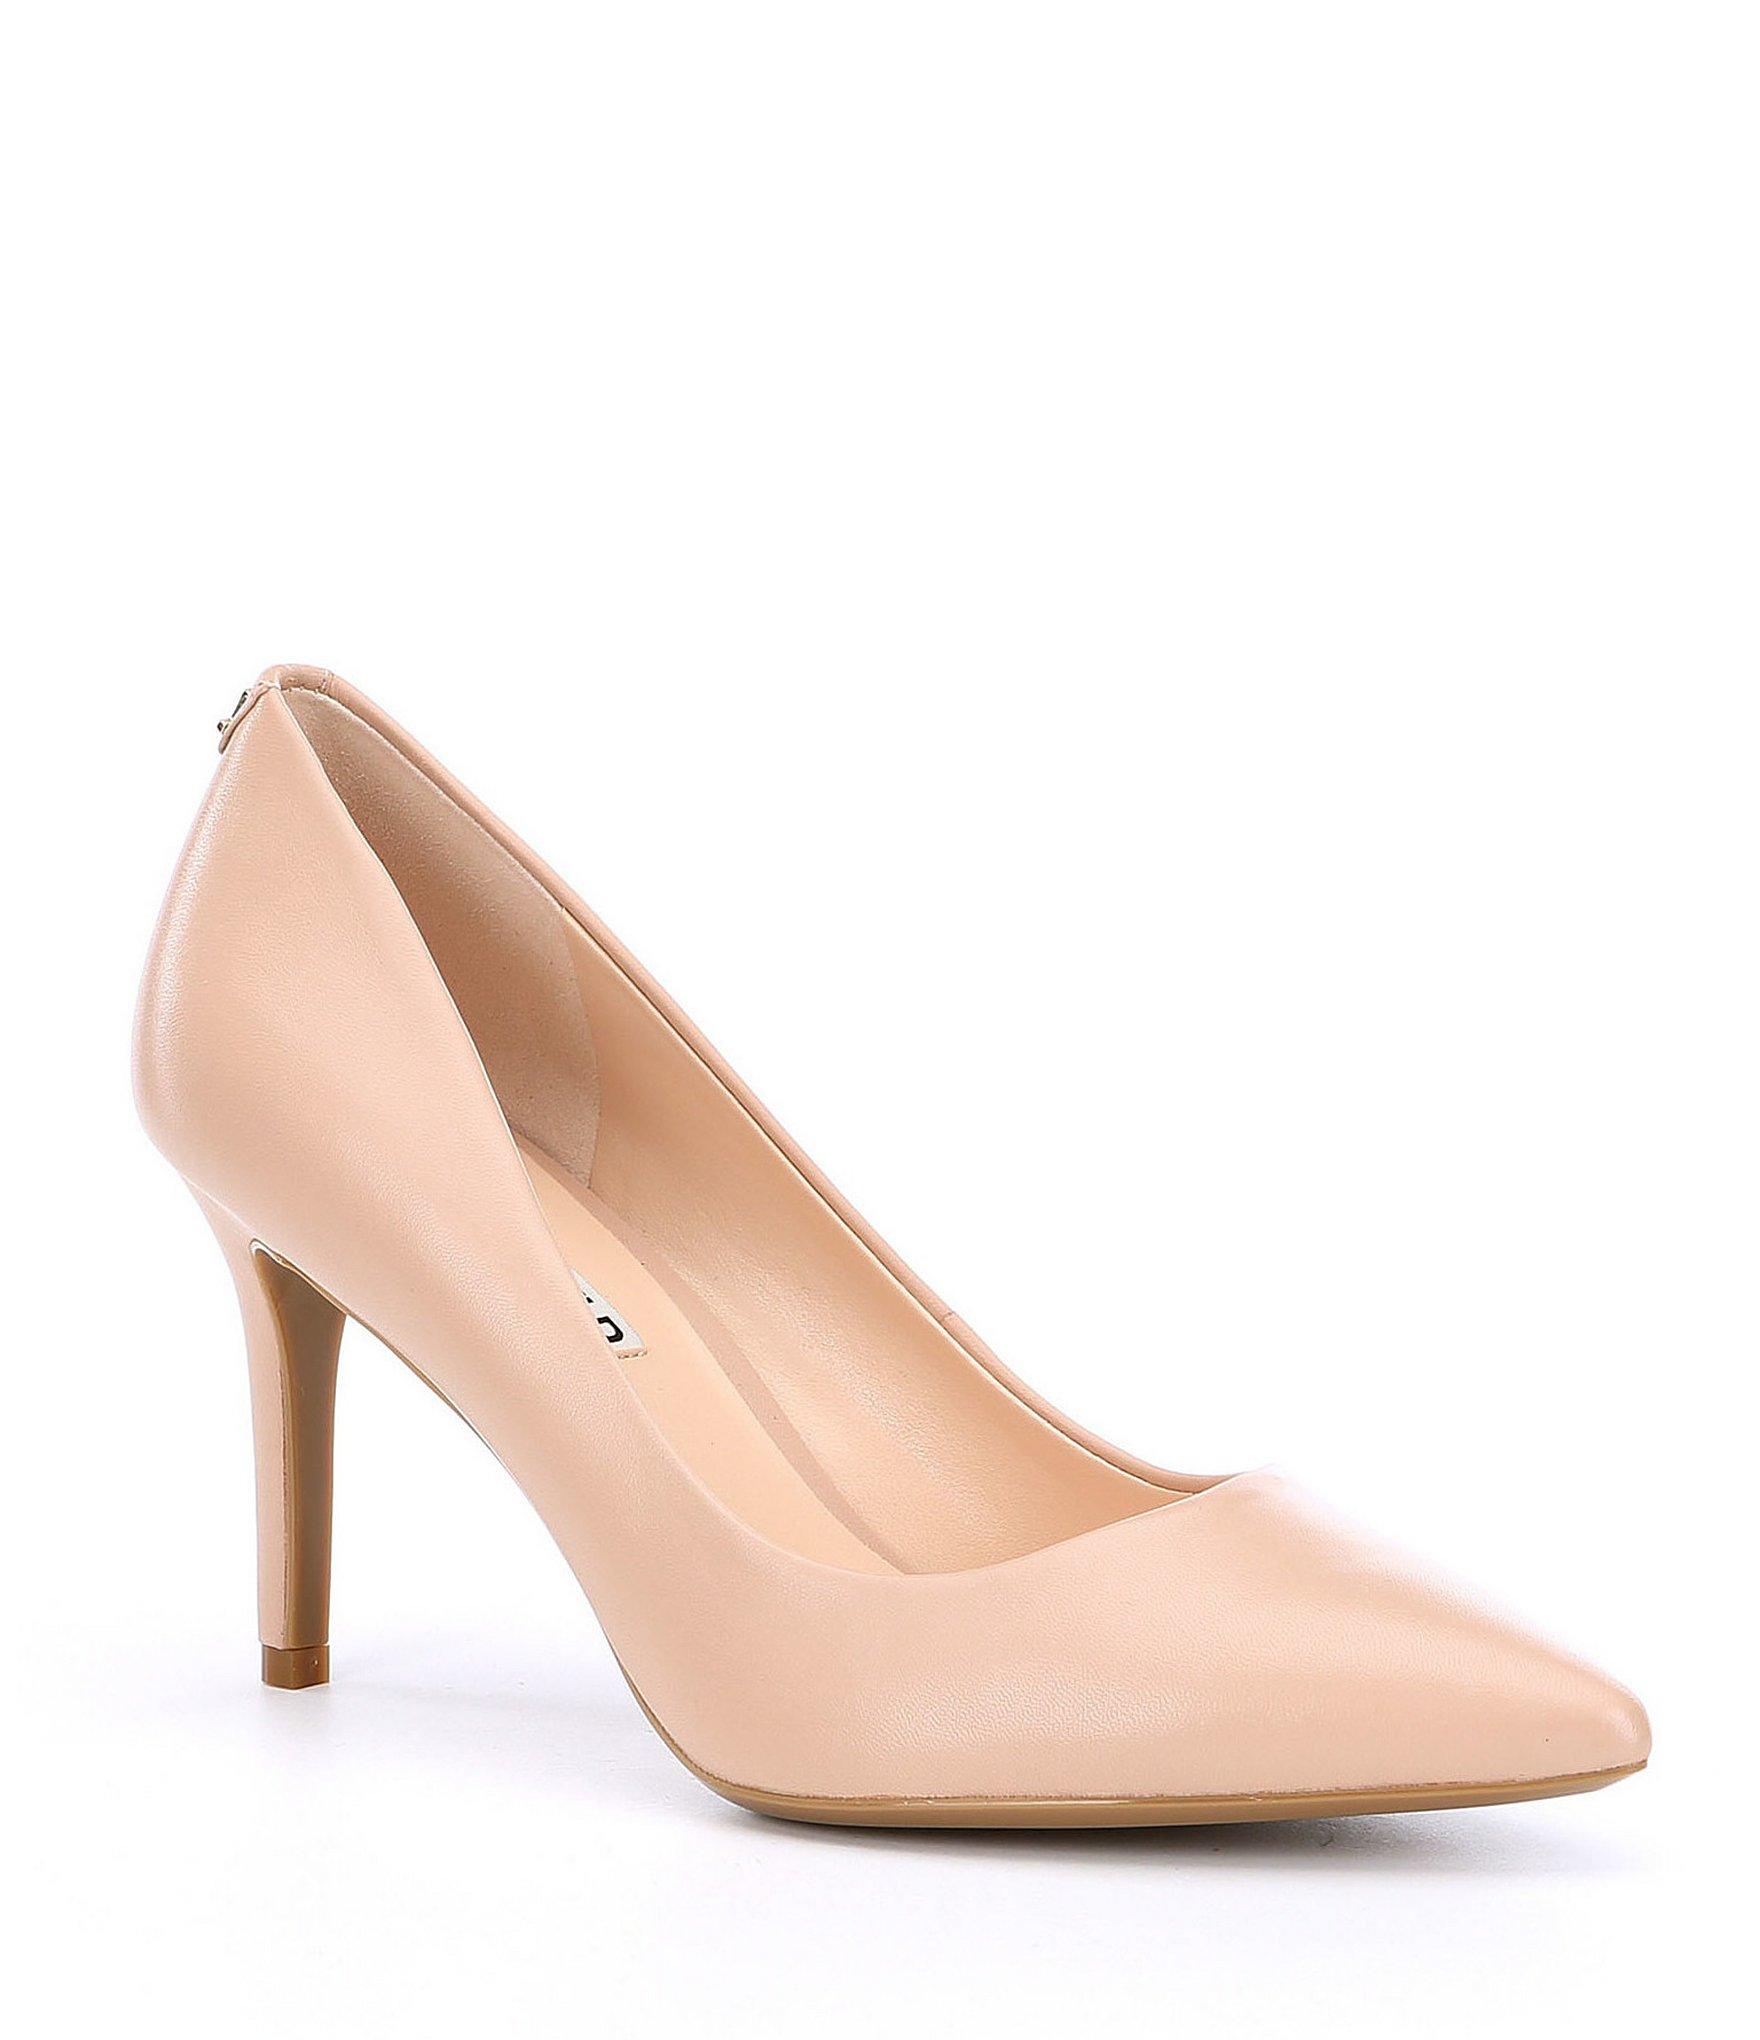 nude shoes nude solid: shoes for women, men u0026 kids | dillards.com OXNYYUS